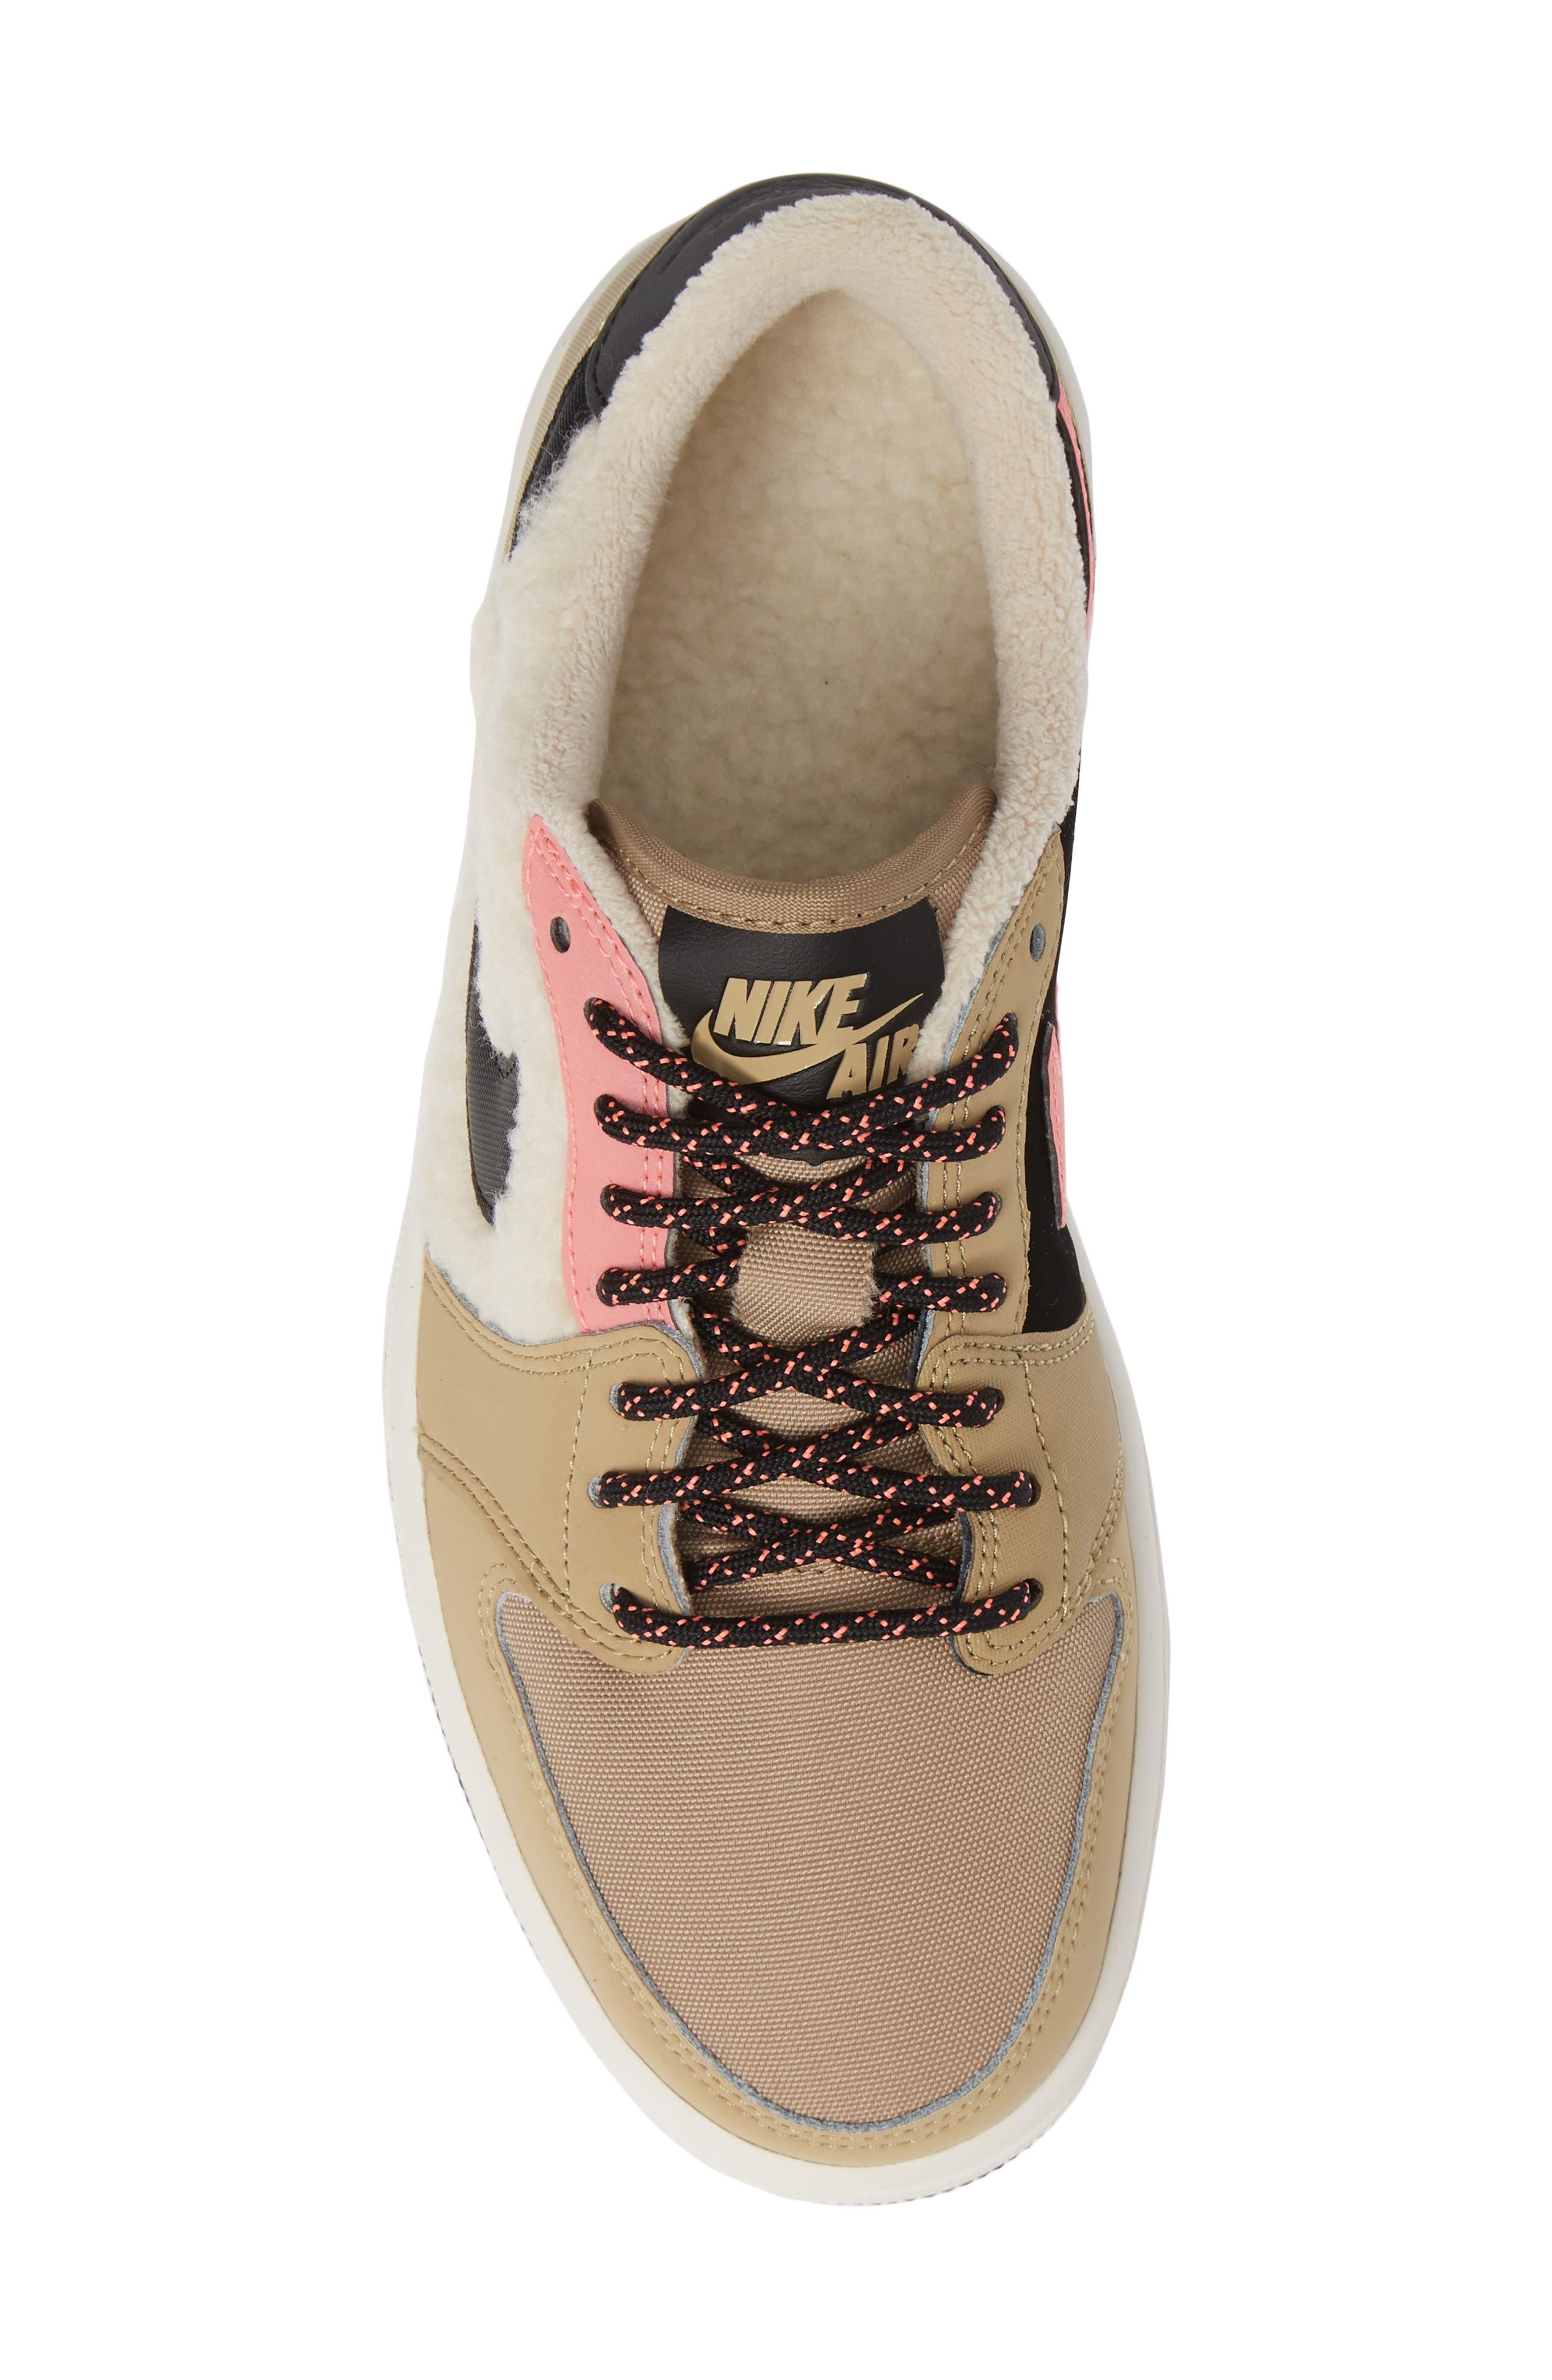 NIKE,                             Air Jordan 1 Retro Low OG Sneaker,                             Alternate thumbnail 5, color,                             200